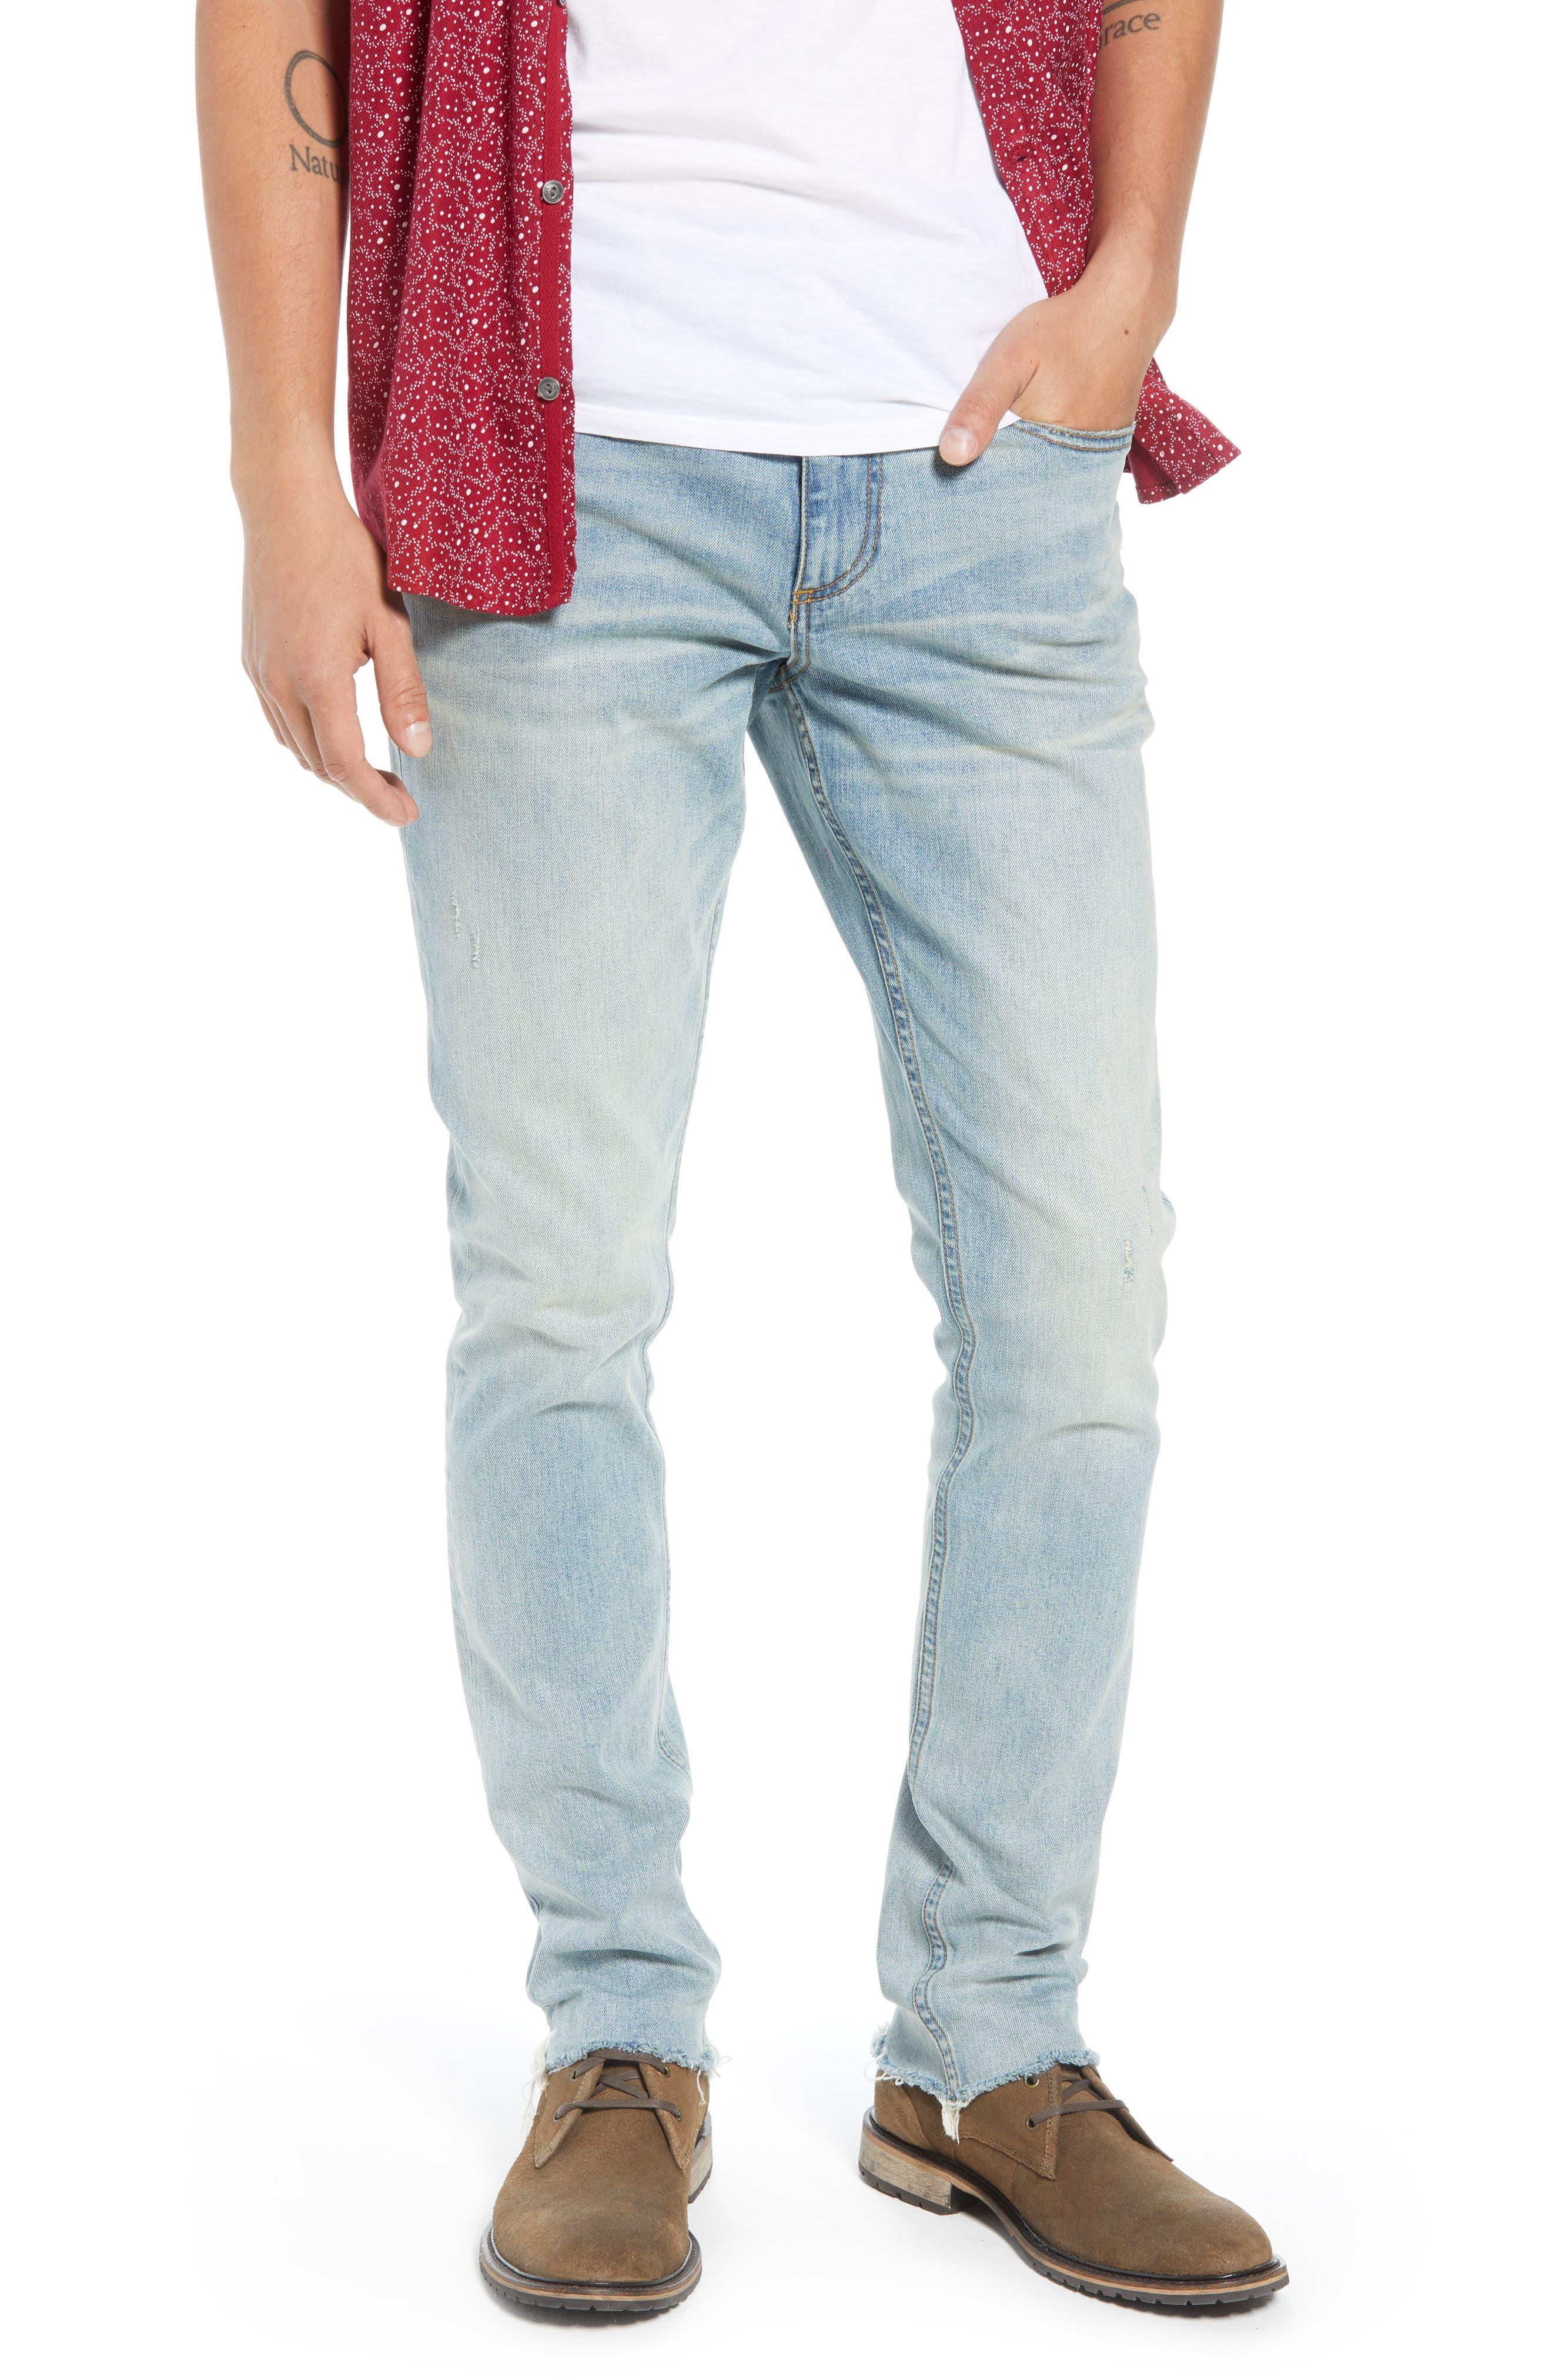 Slim Fit Jeans,                         Main,                         color, BLUE FADED LIGHT WASH